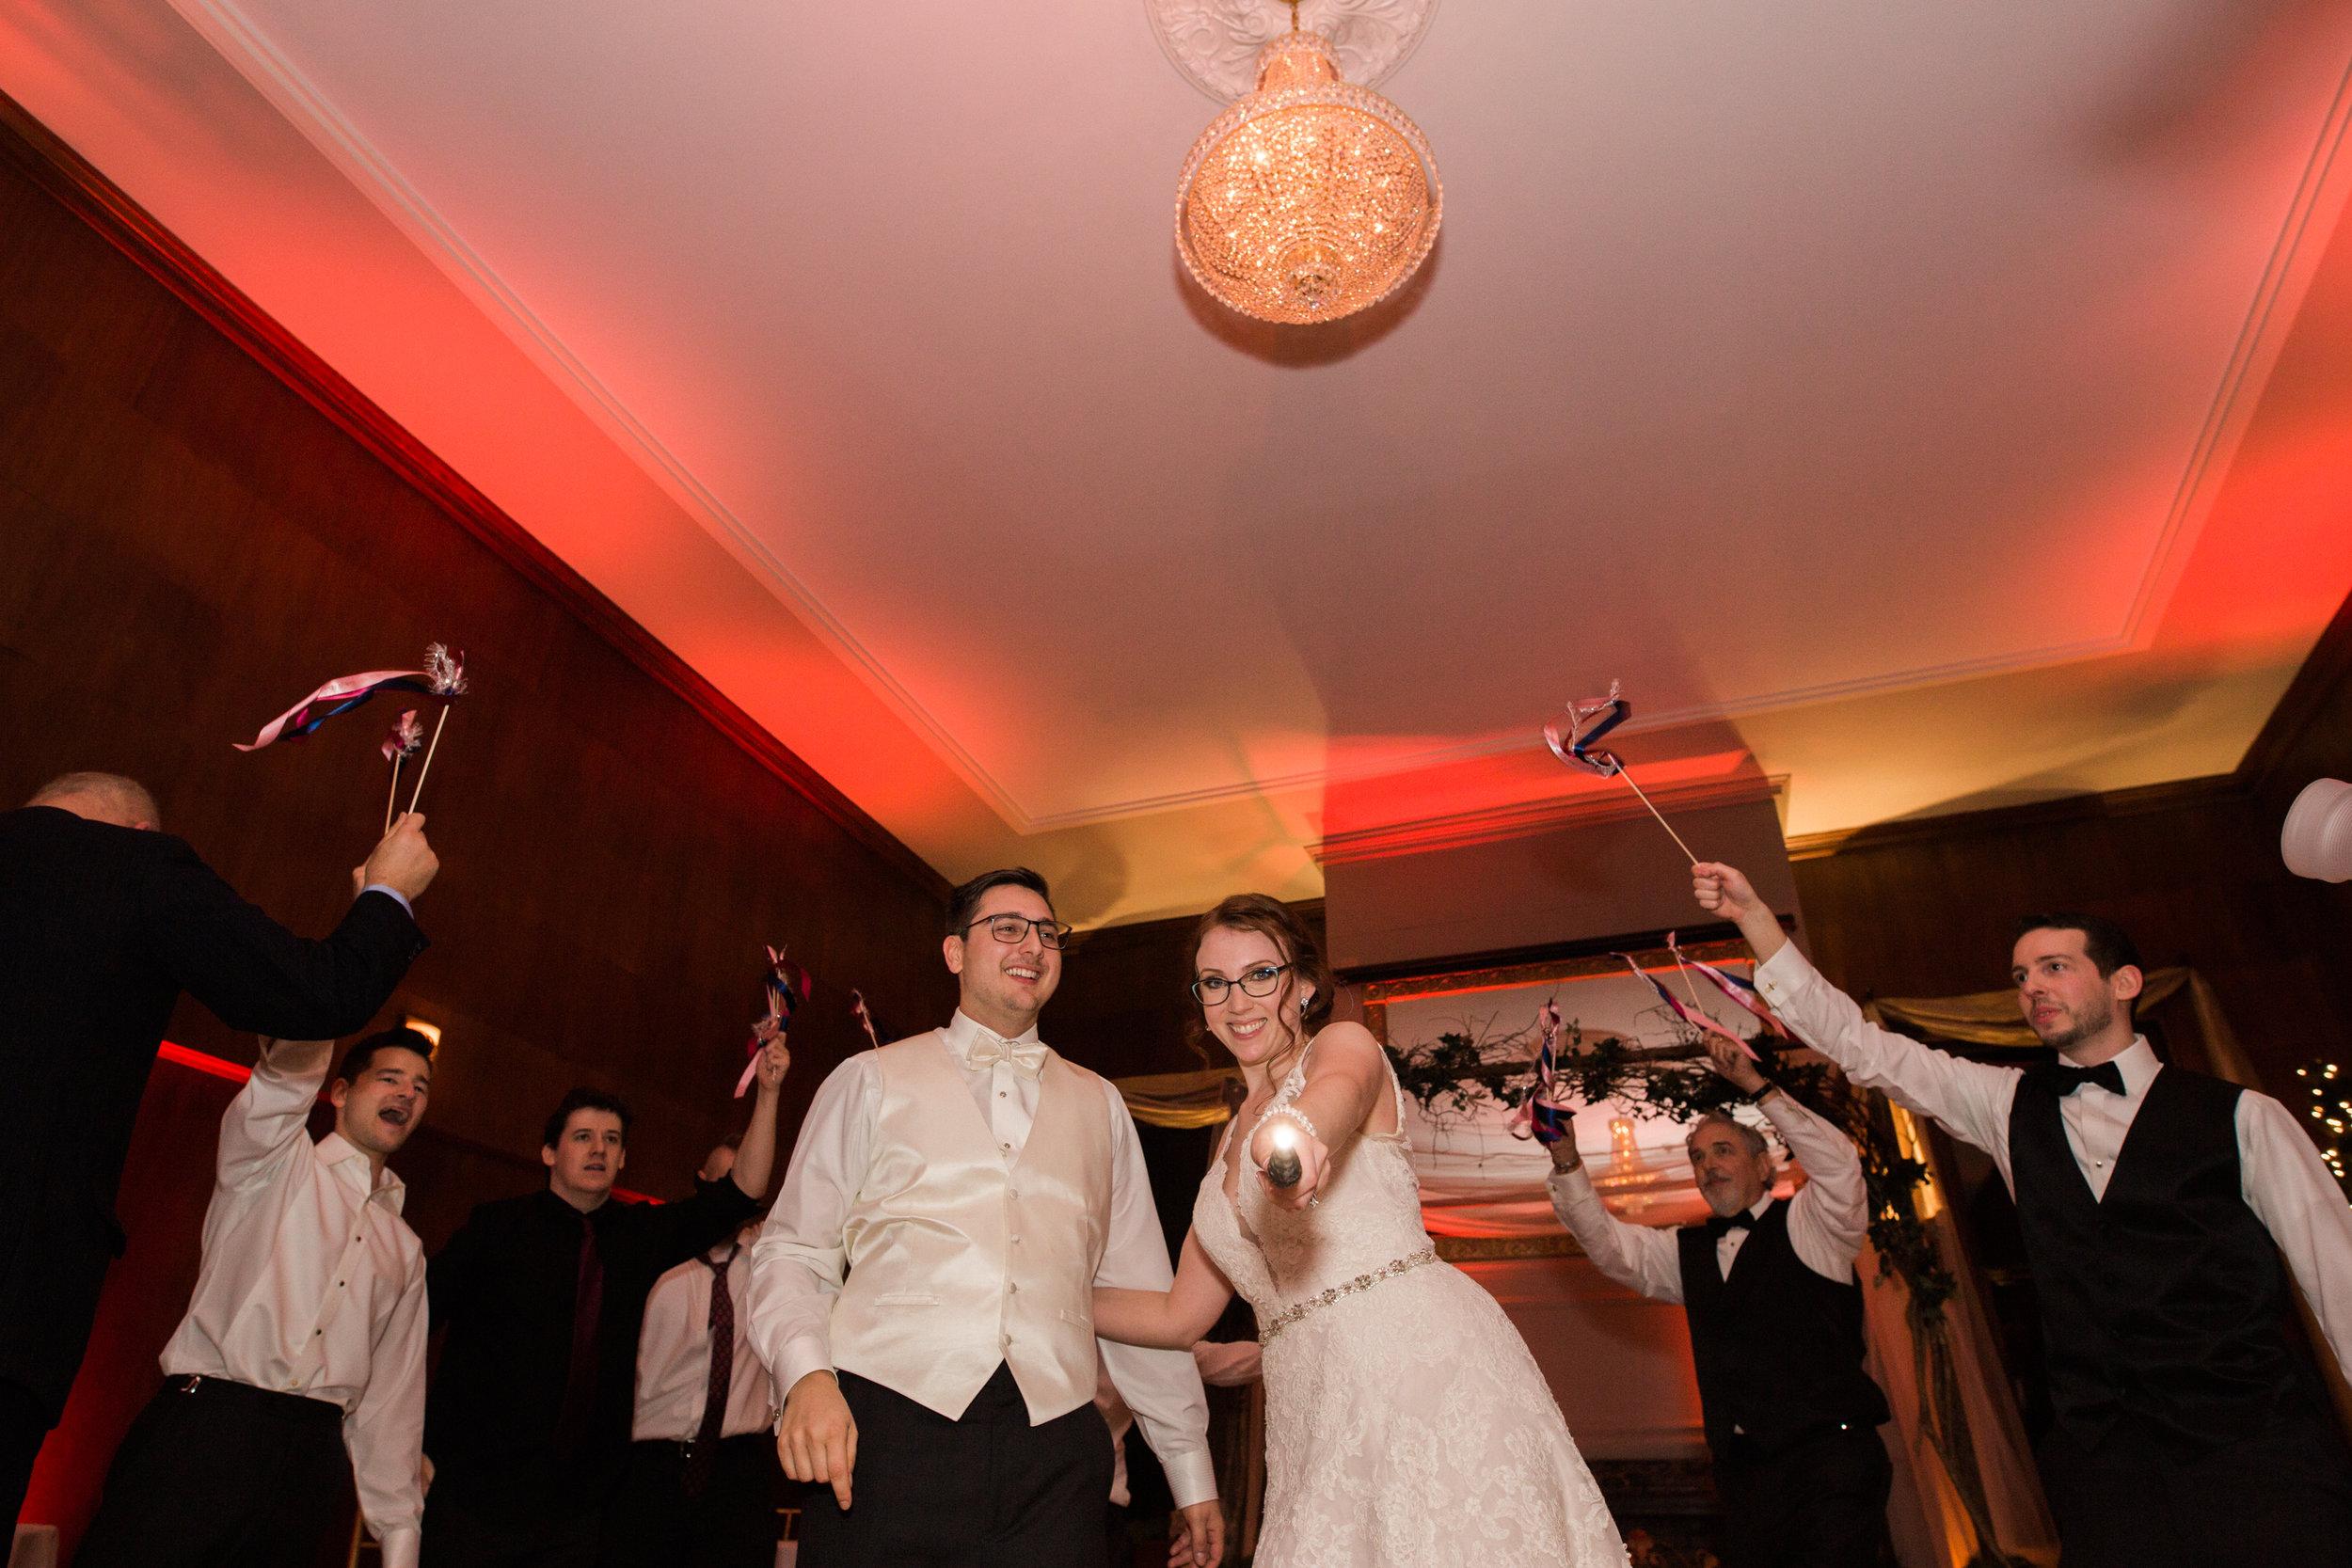 Harry Potter Wedding at Overhills Mansion Catonville Maryland Wedding Photographers Megapixels Media (129 of 134).jpg